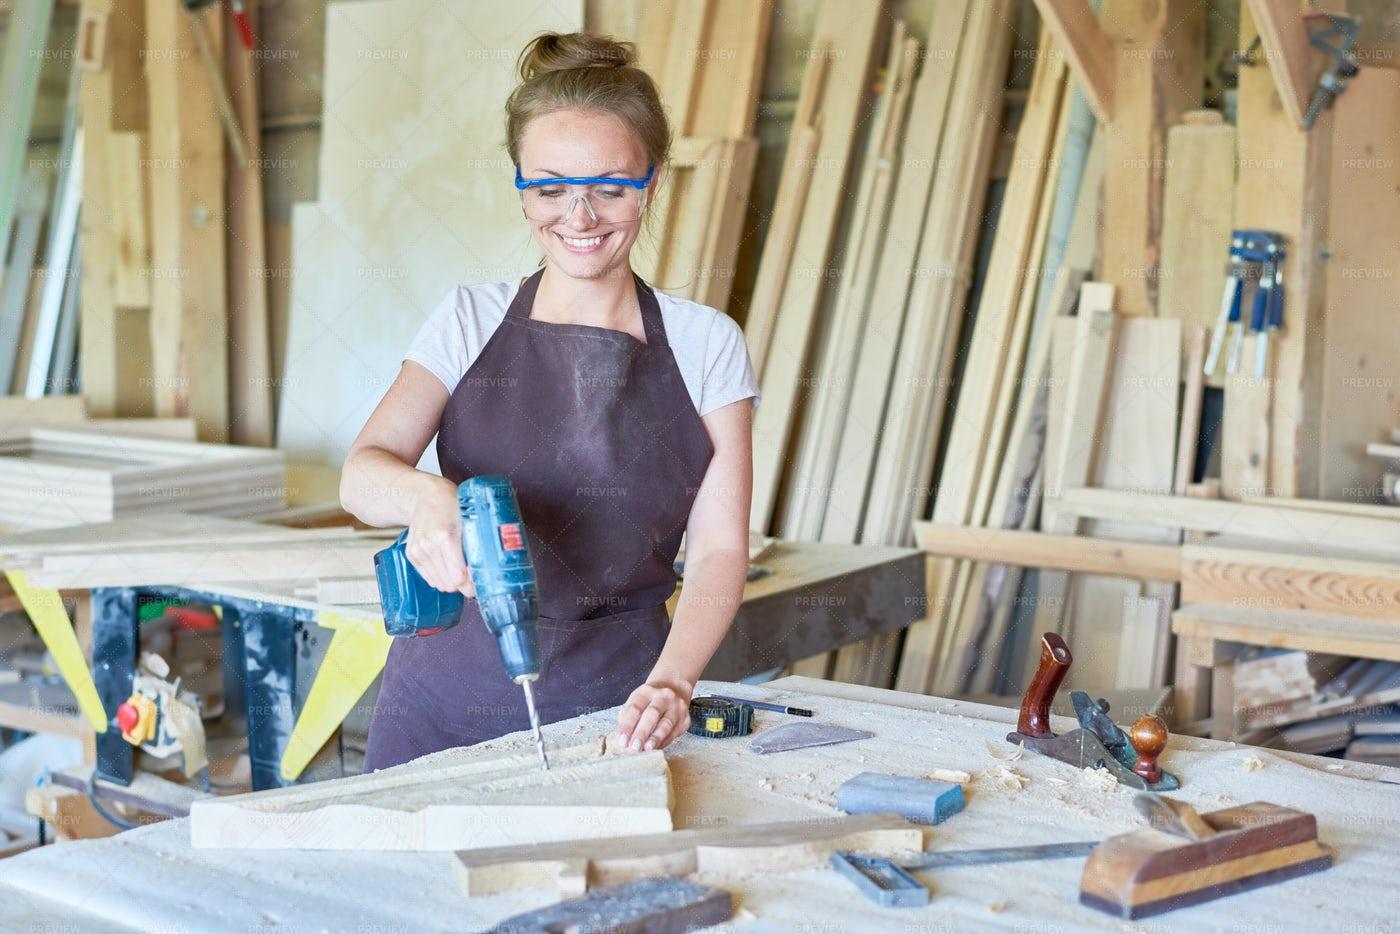 Smiling Female Carpenter Working In...: Stock Photos